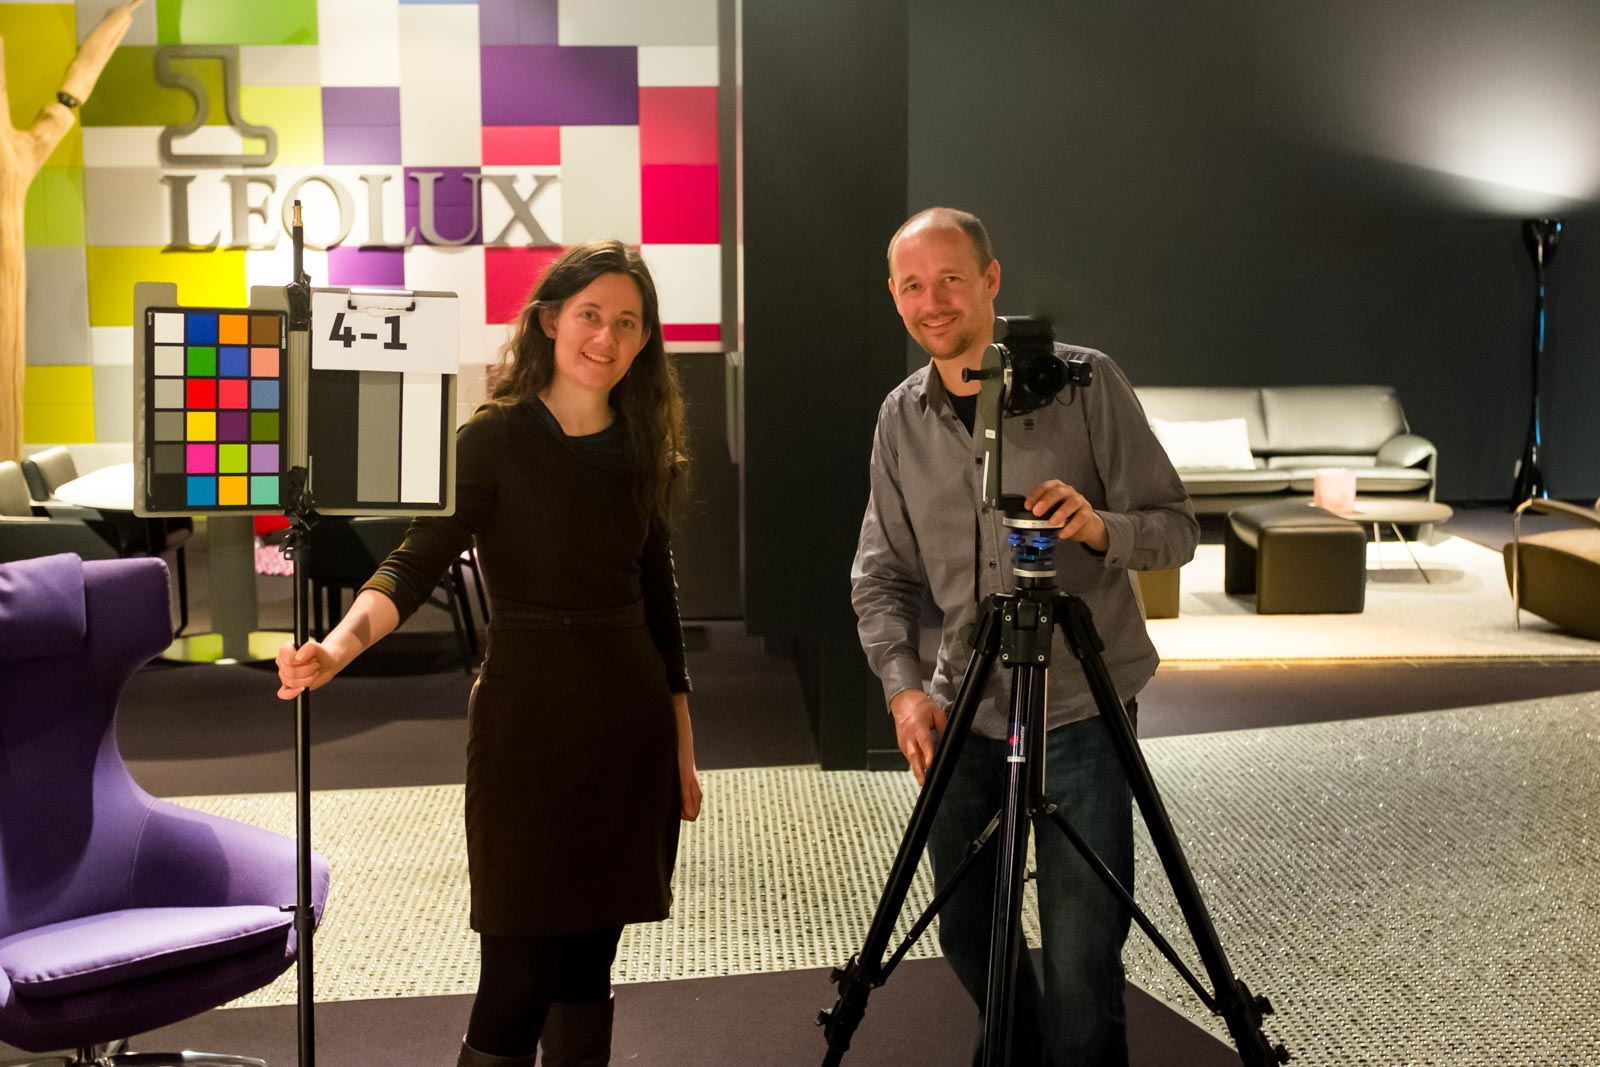 Marije and Redmar at work at Leolux Design Center